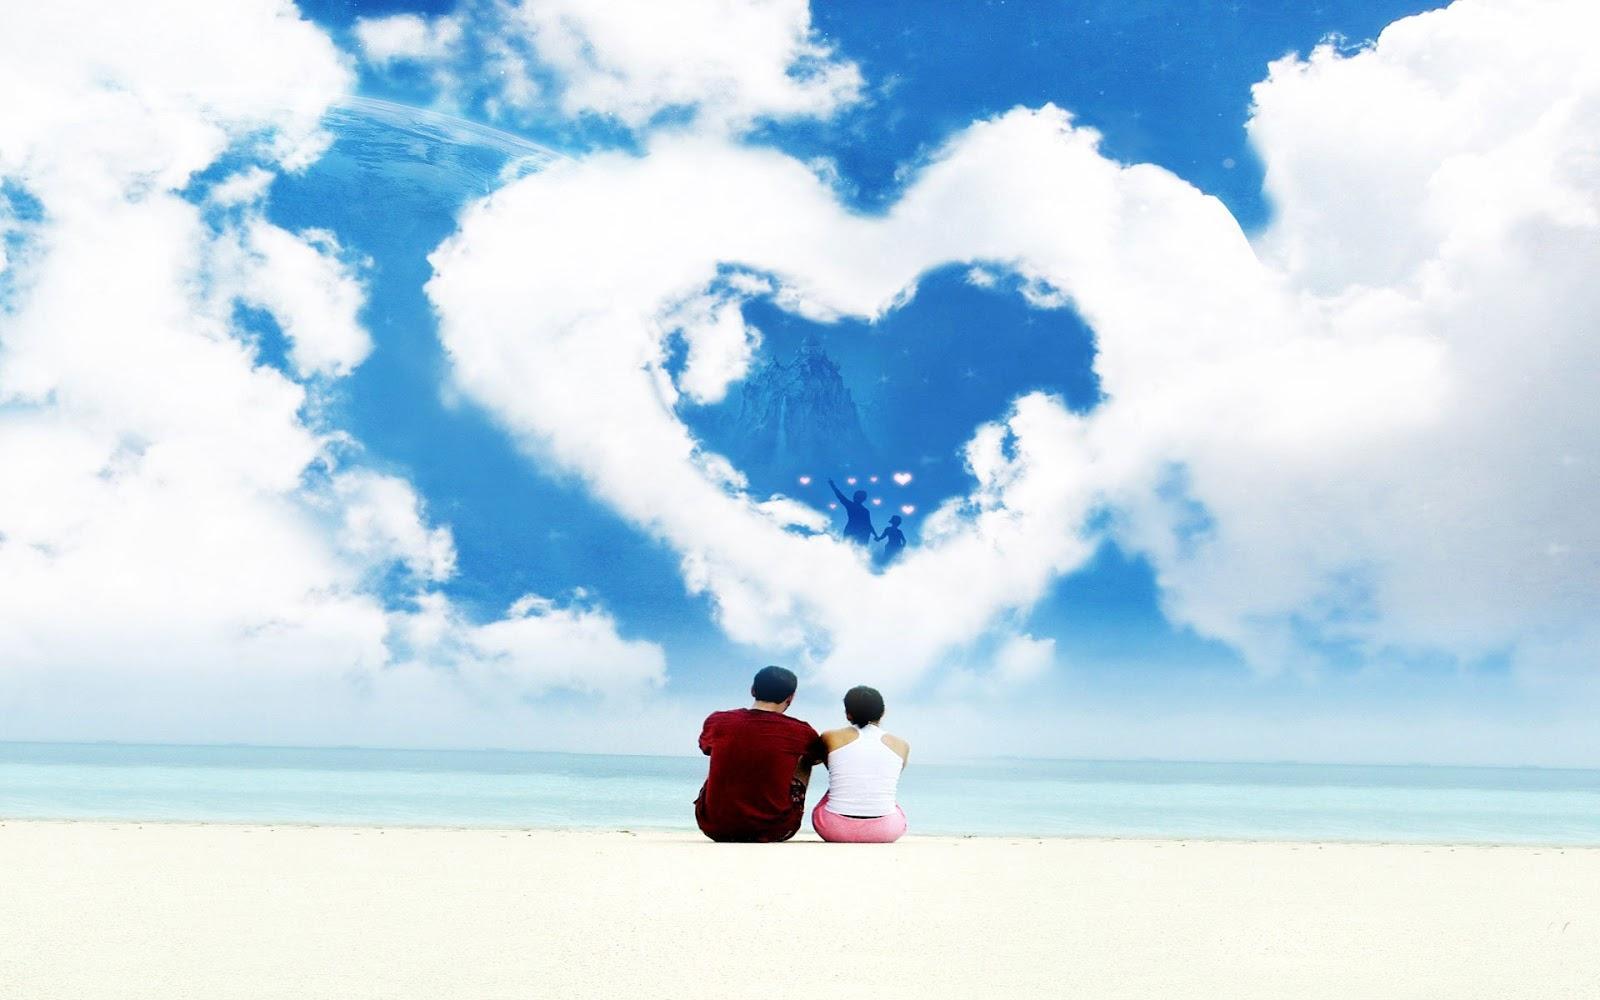 Poze Cu Dragoste Poze De Dragoste